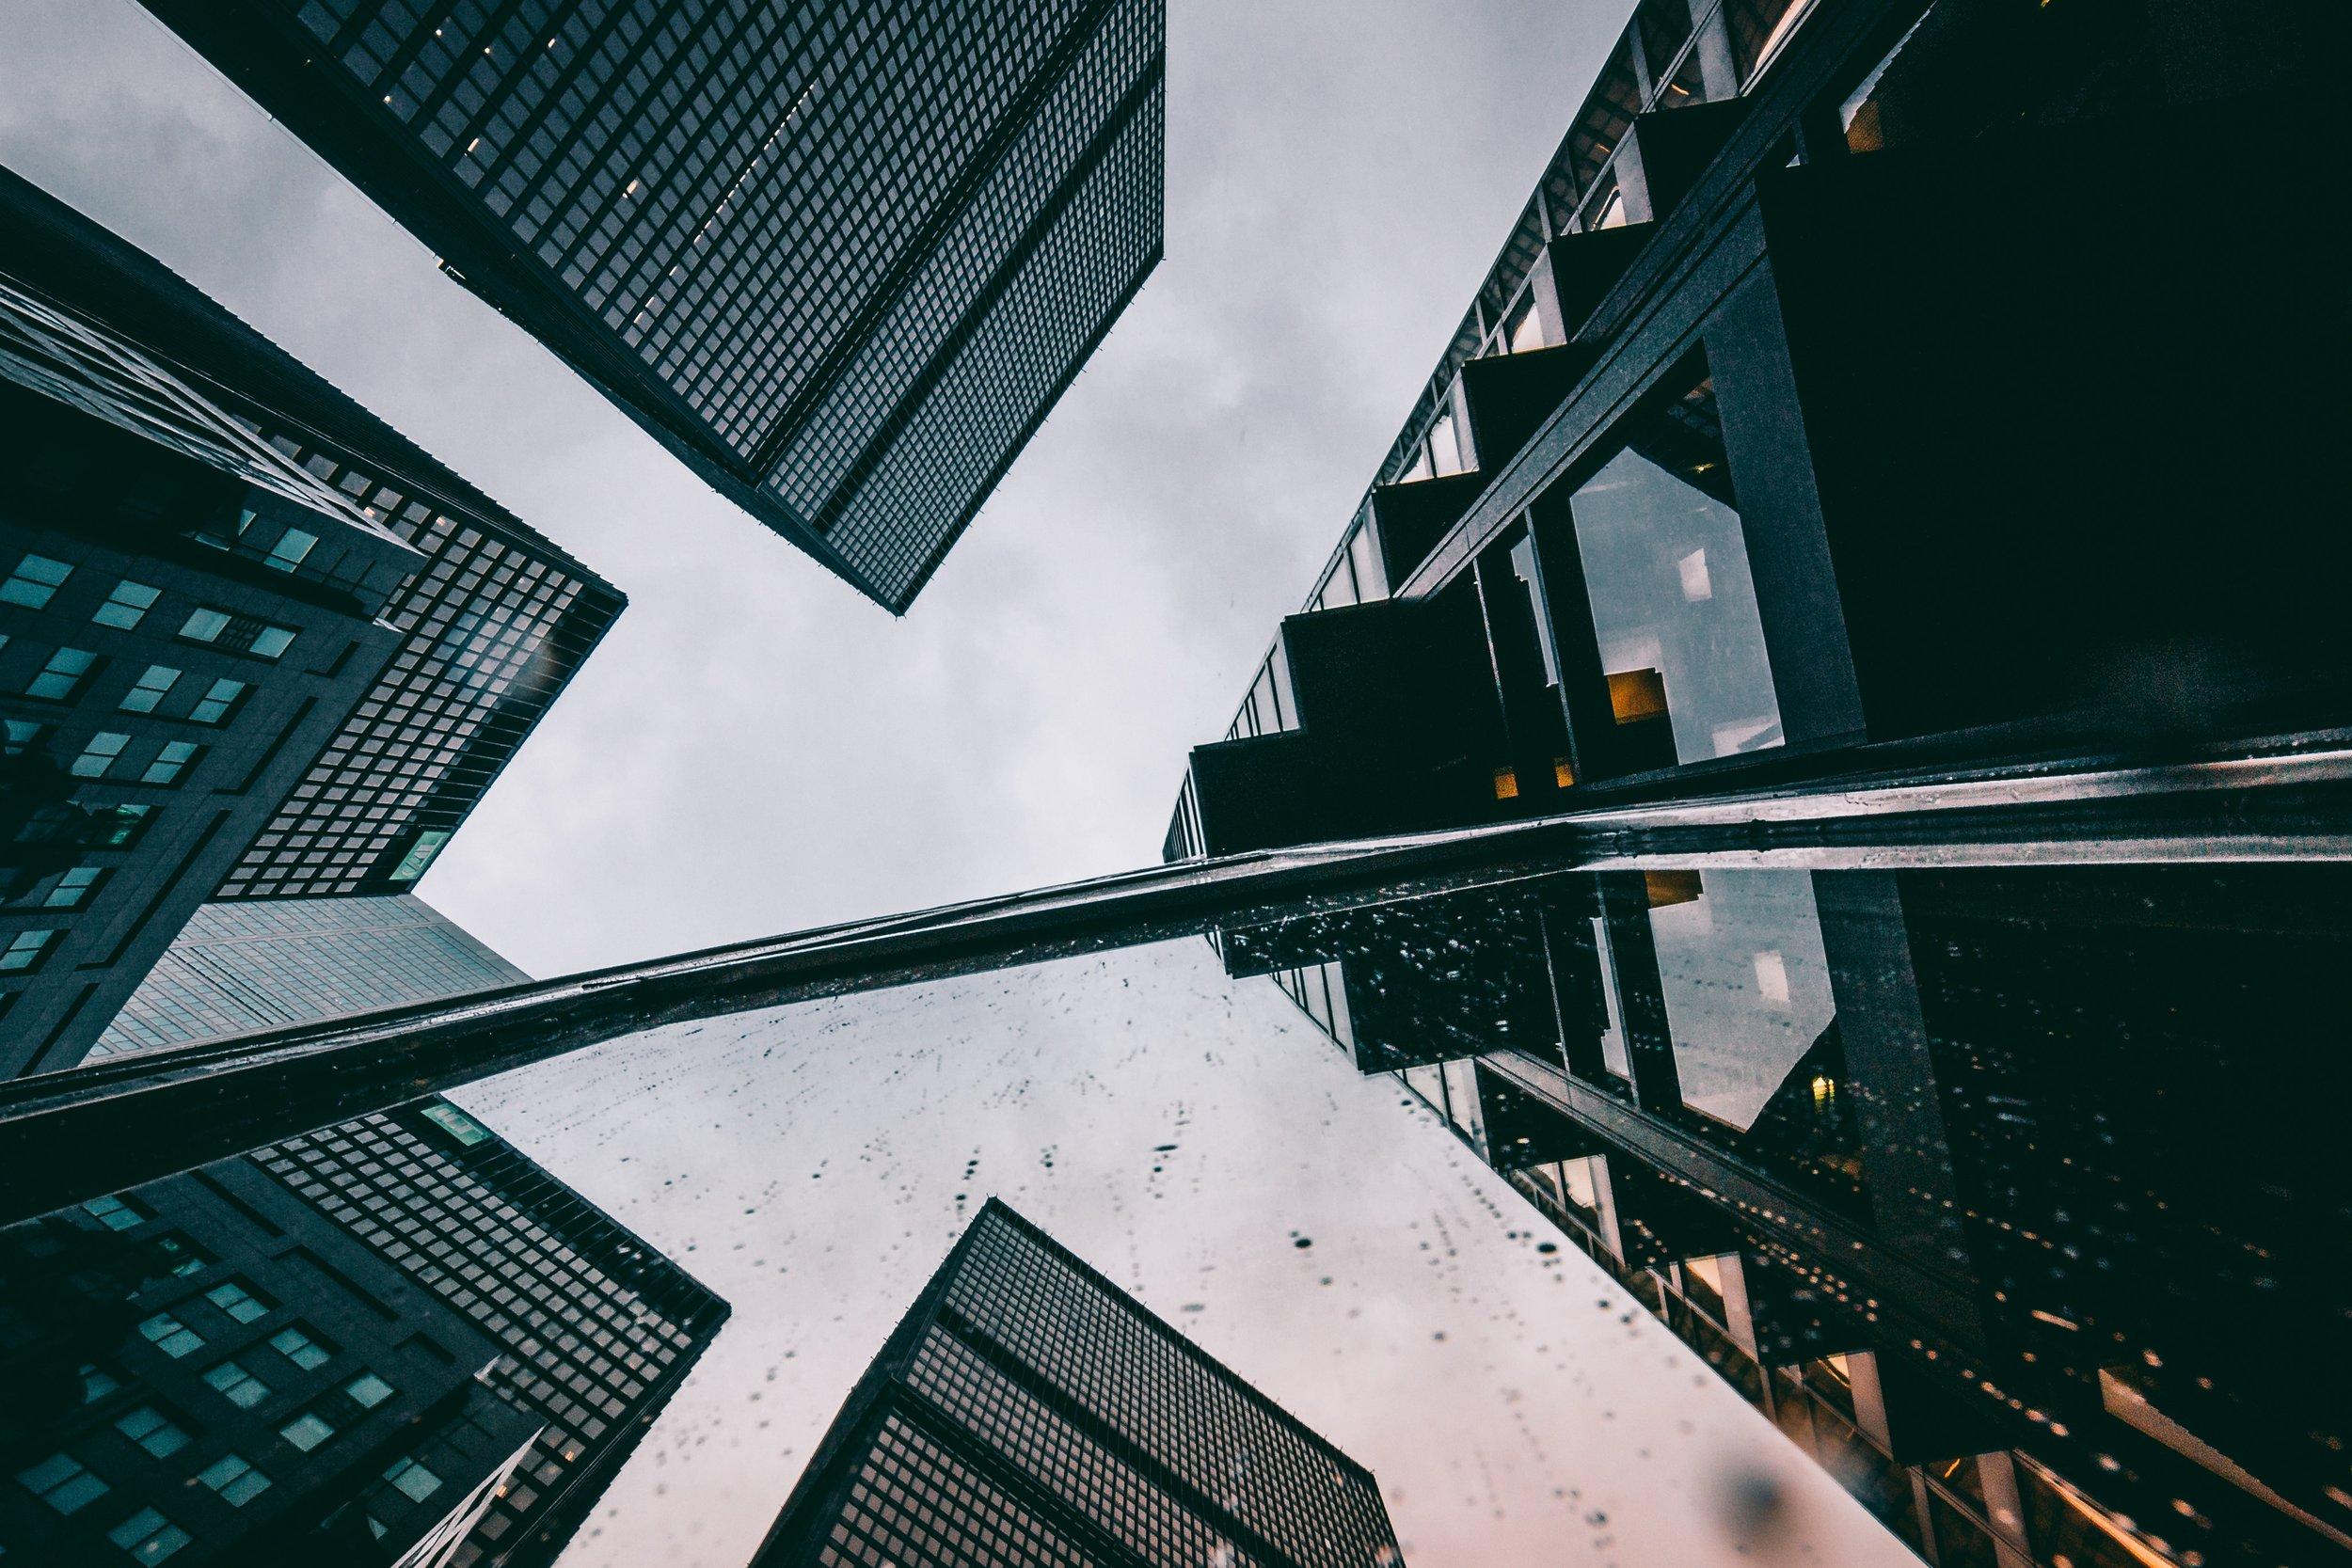 architecture-bridge-buildings-374018.jpg